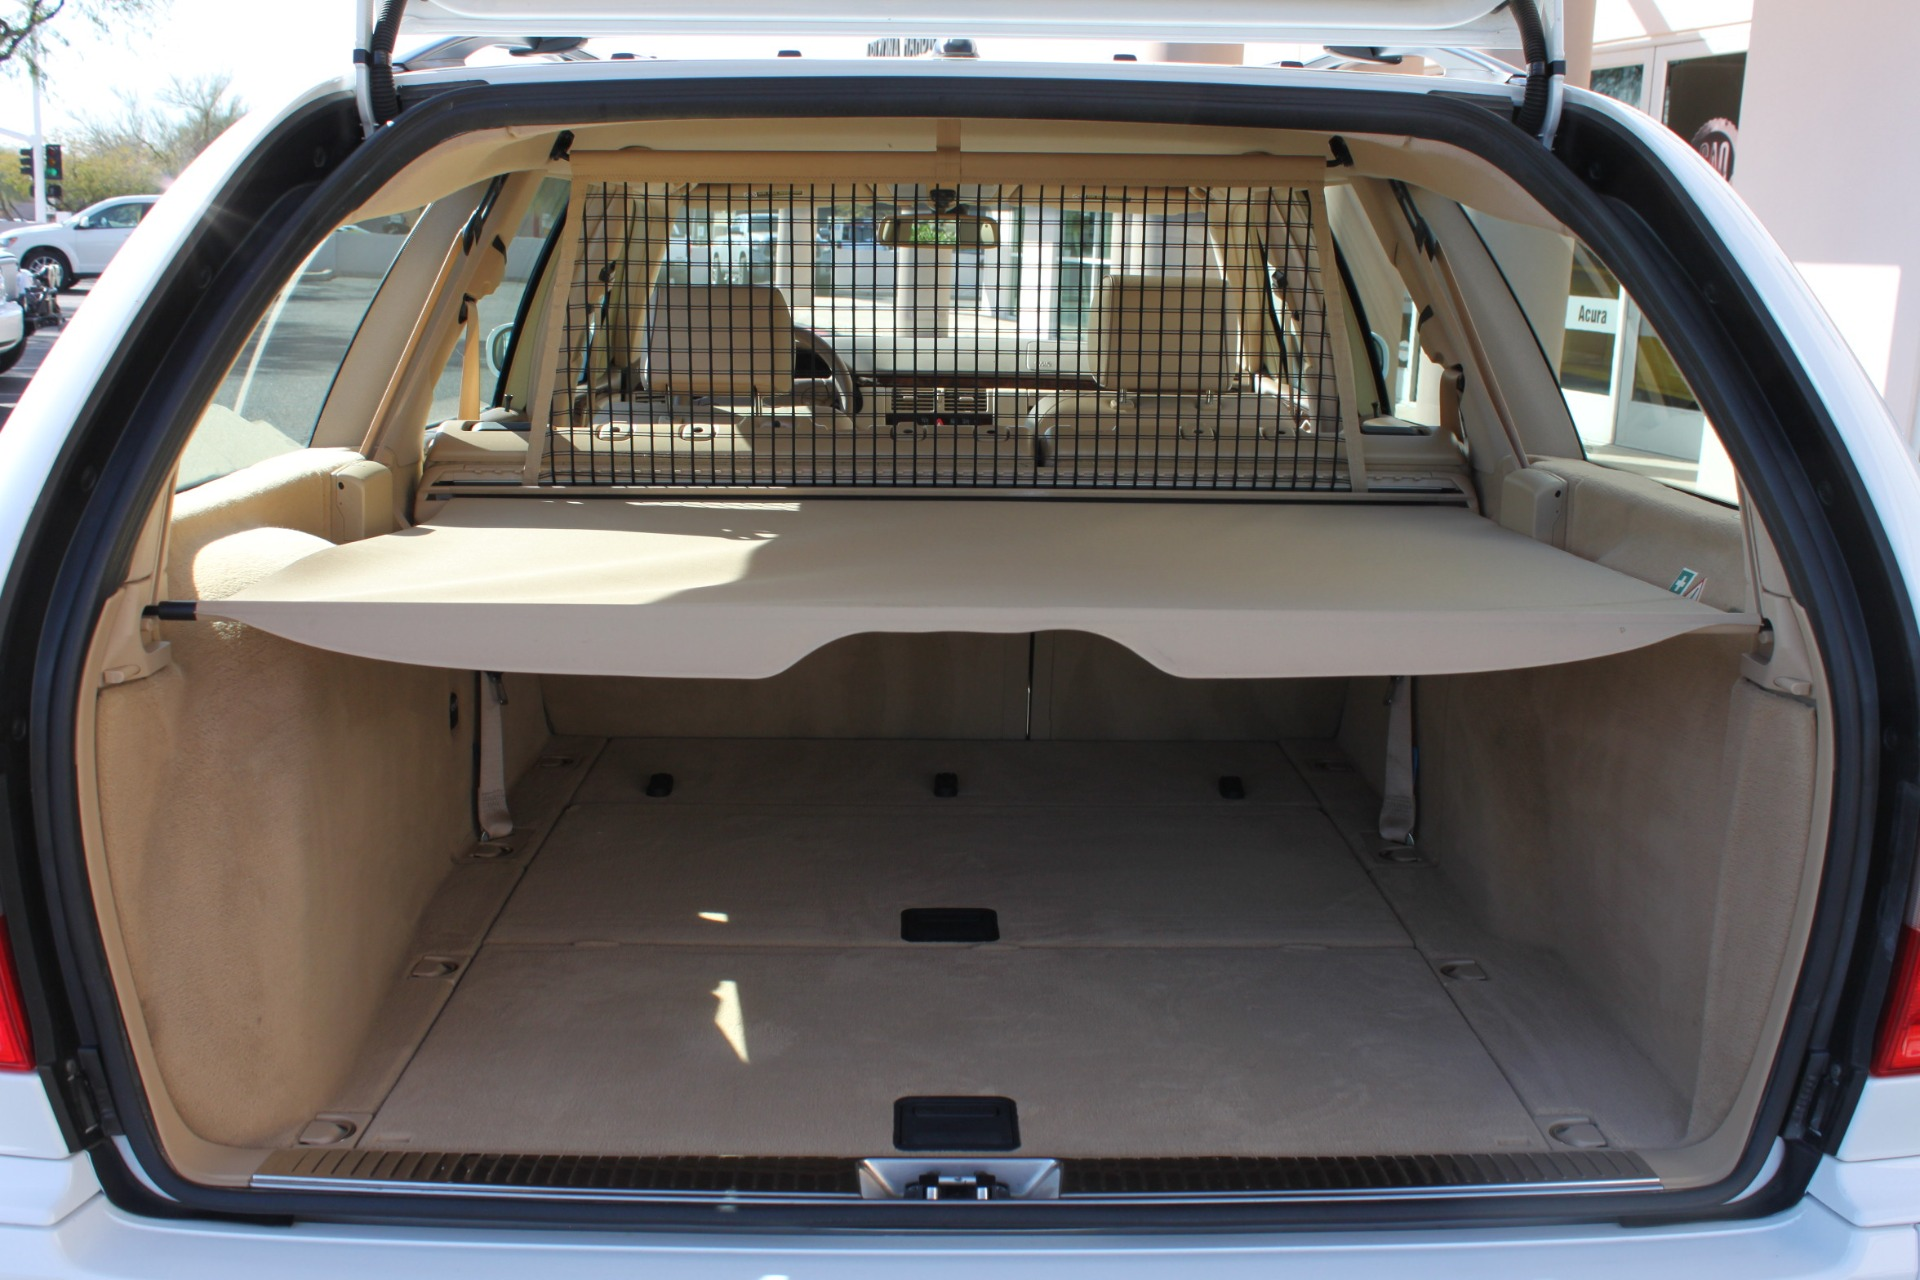 Used-2000-Mercedes-Benz-E-Class-Chevelle